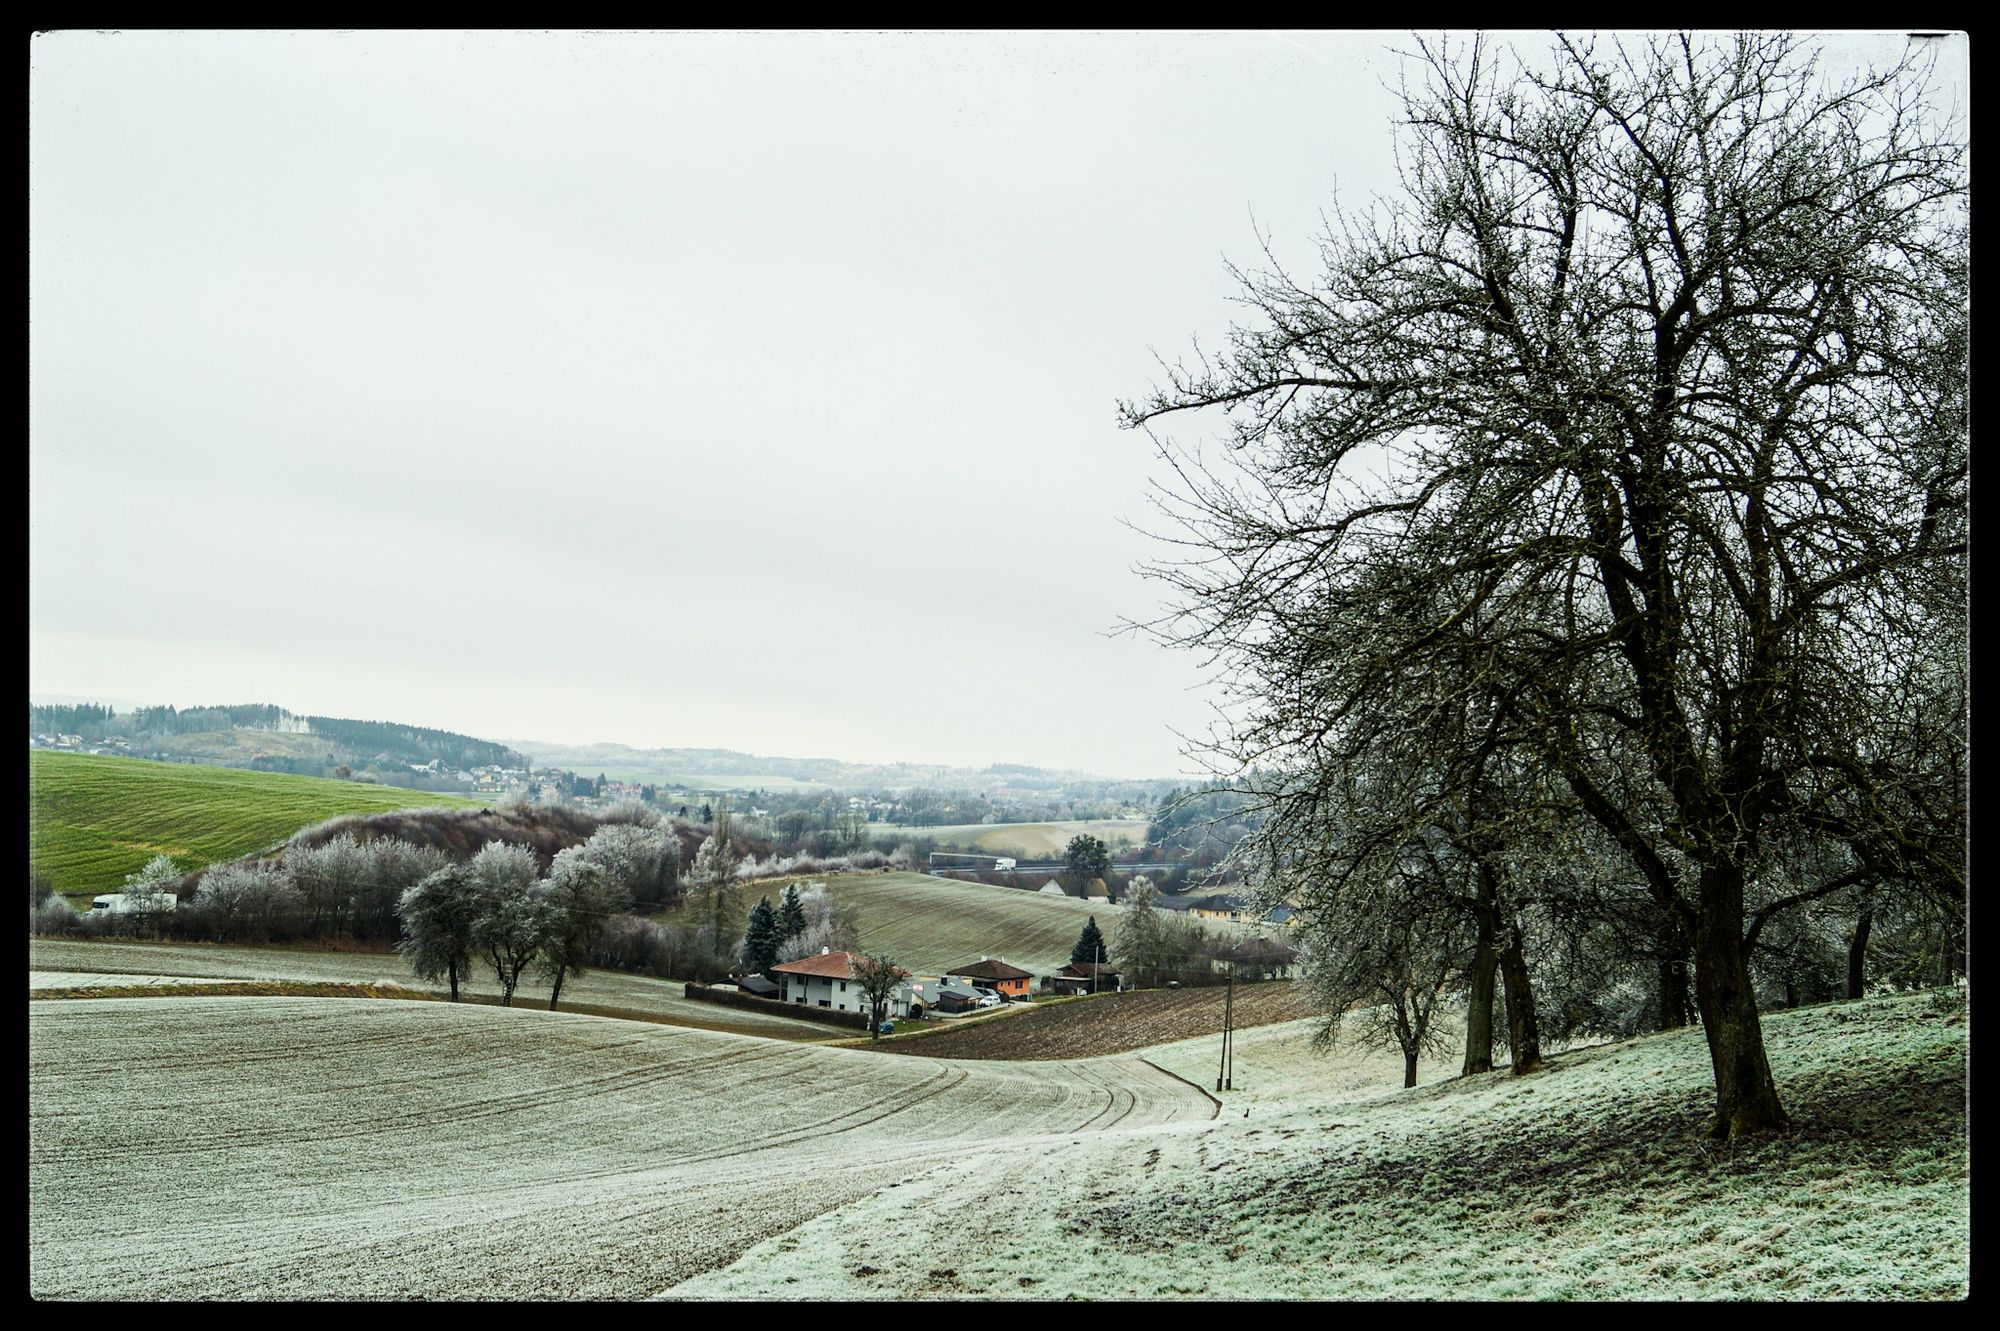 Rauhreif zu Neujahr am Wundersberg